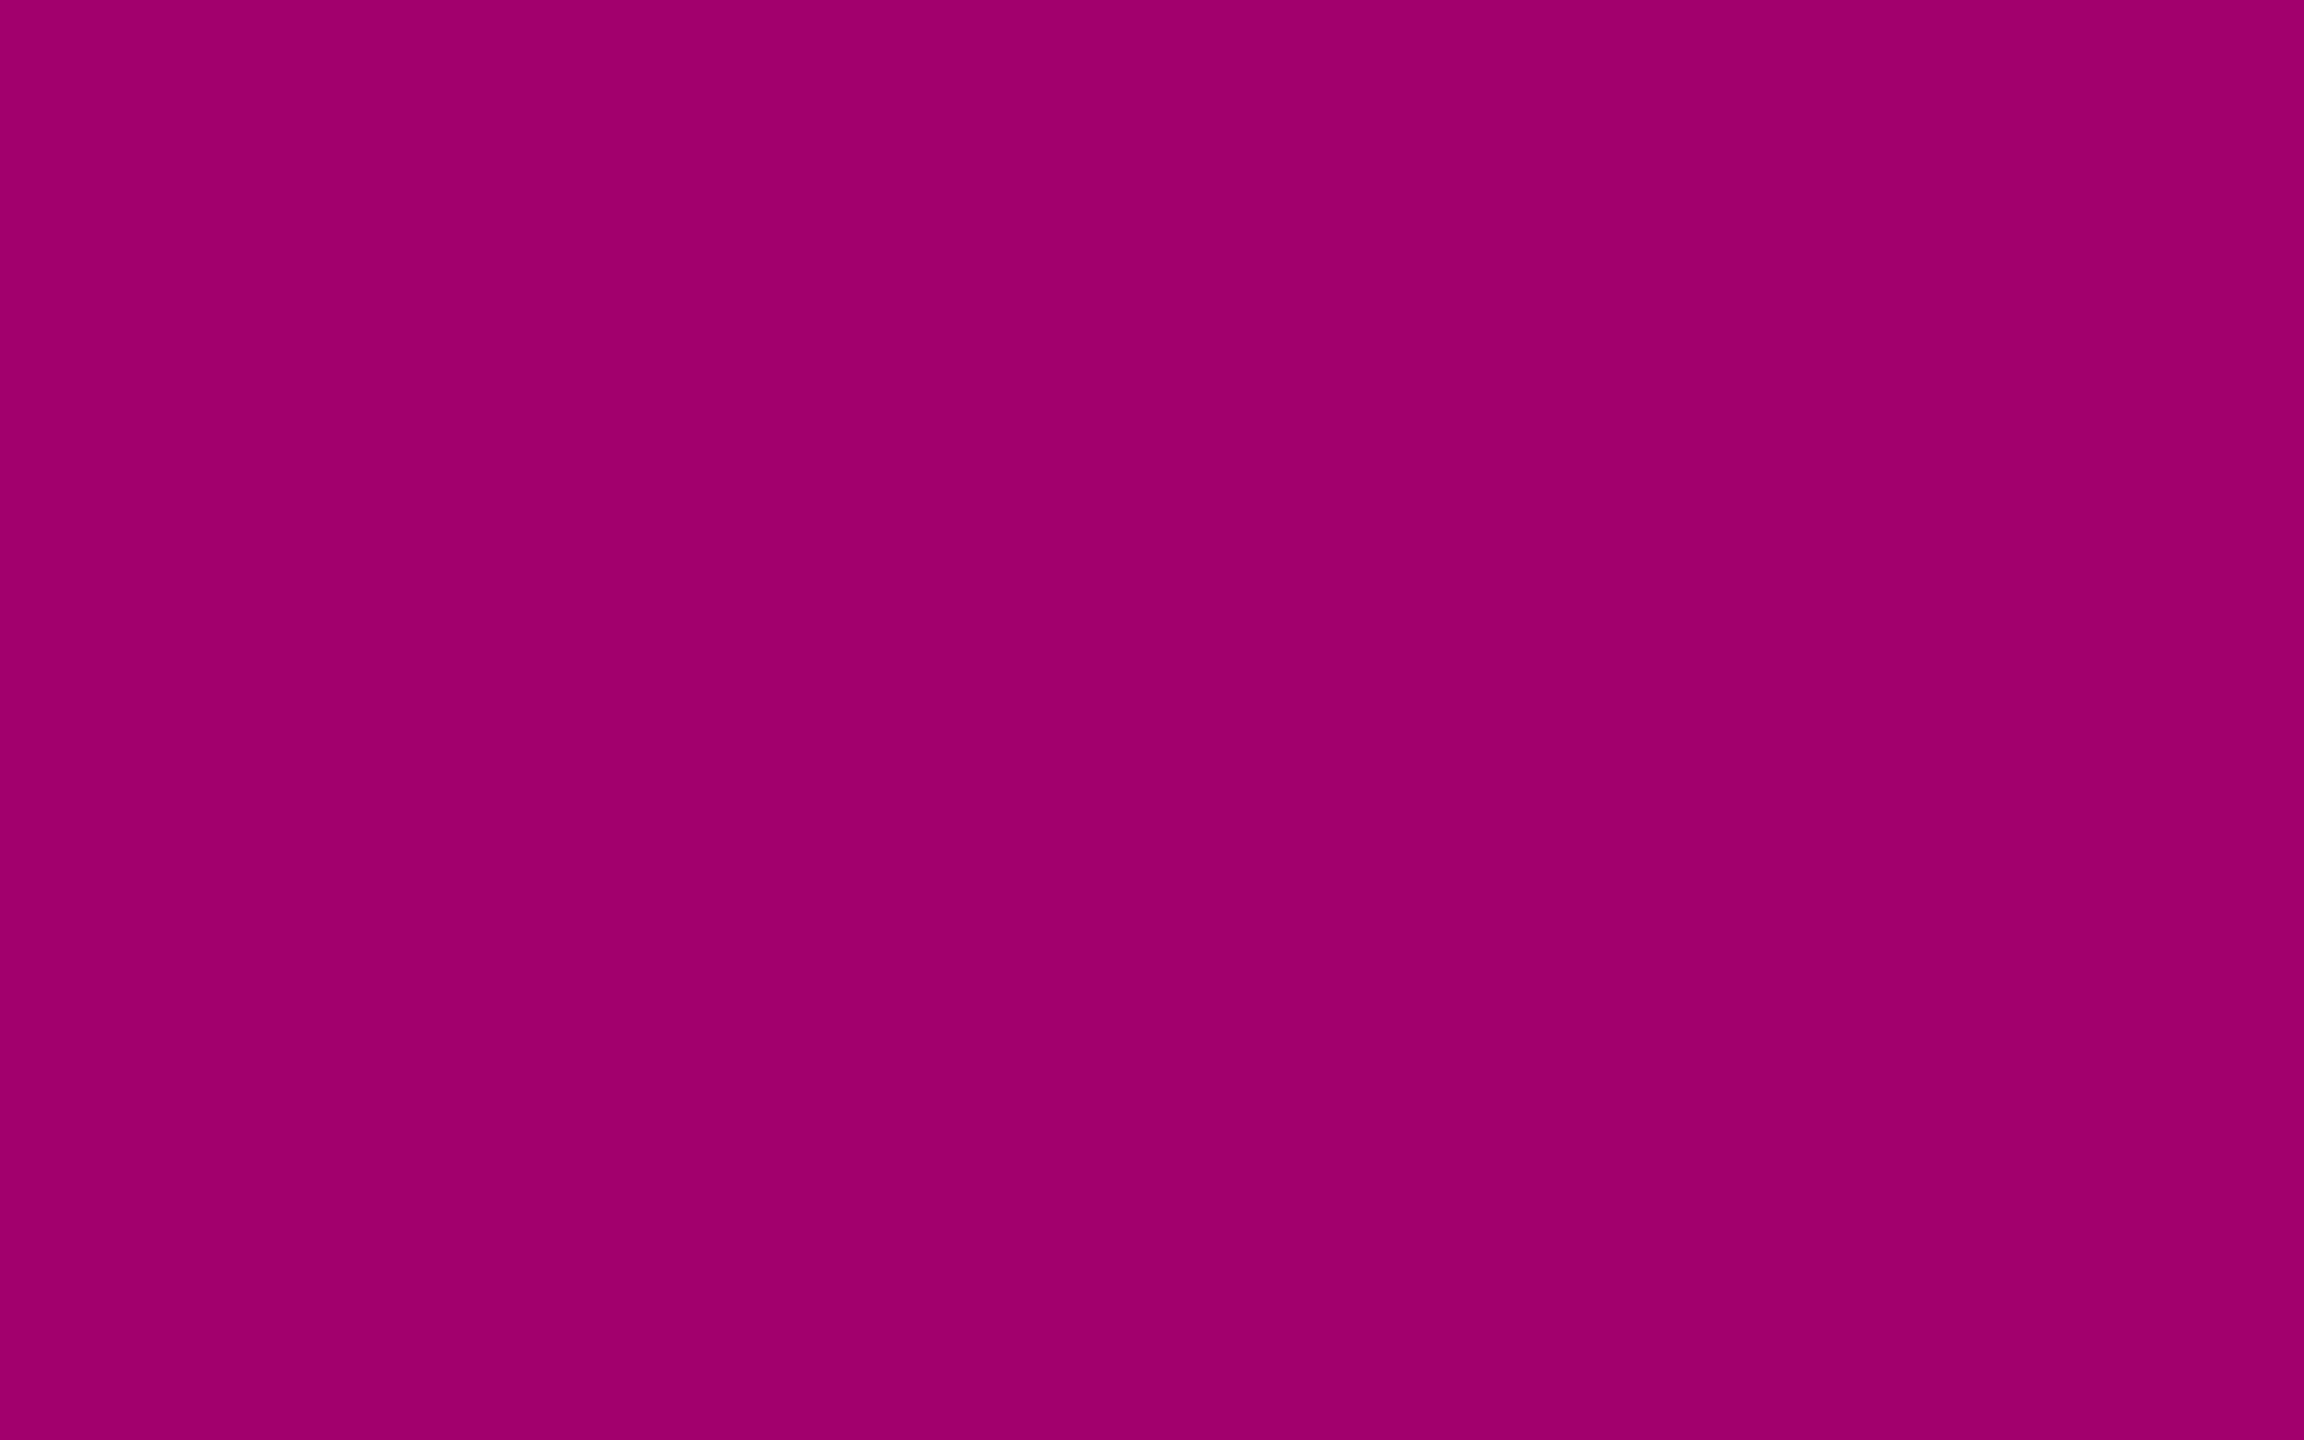 2304x1440 Flirt Solid Color Background